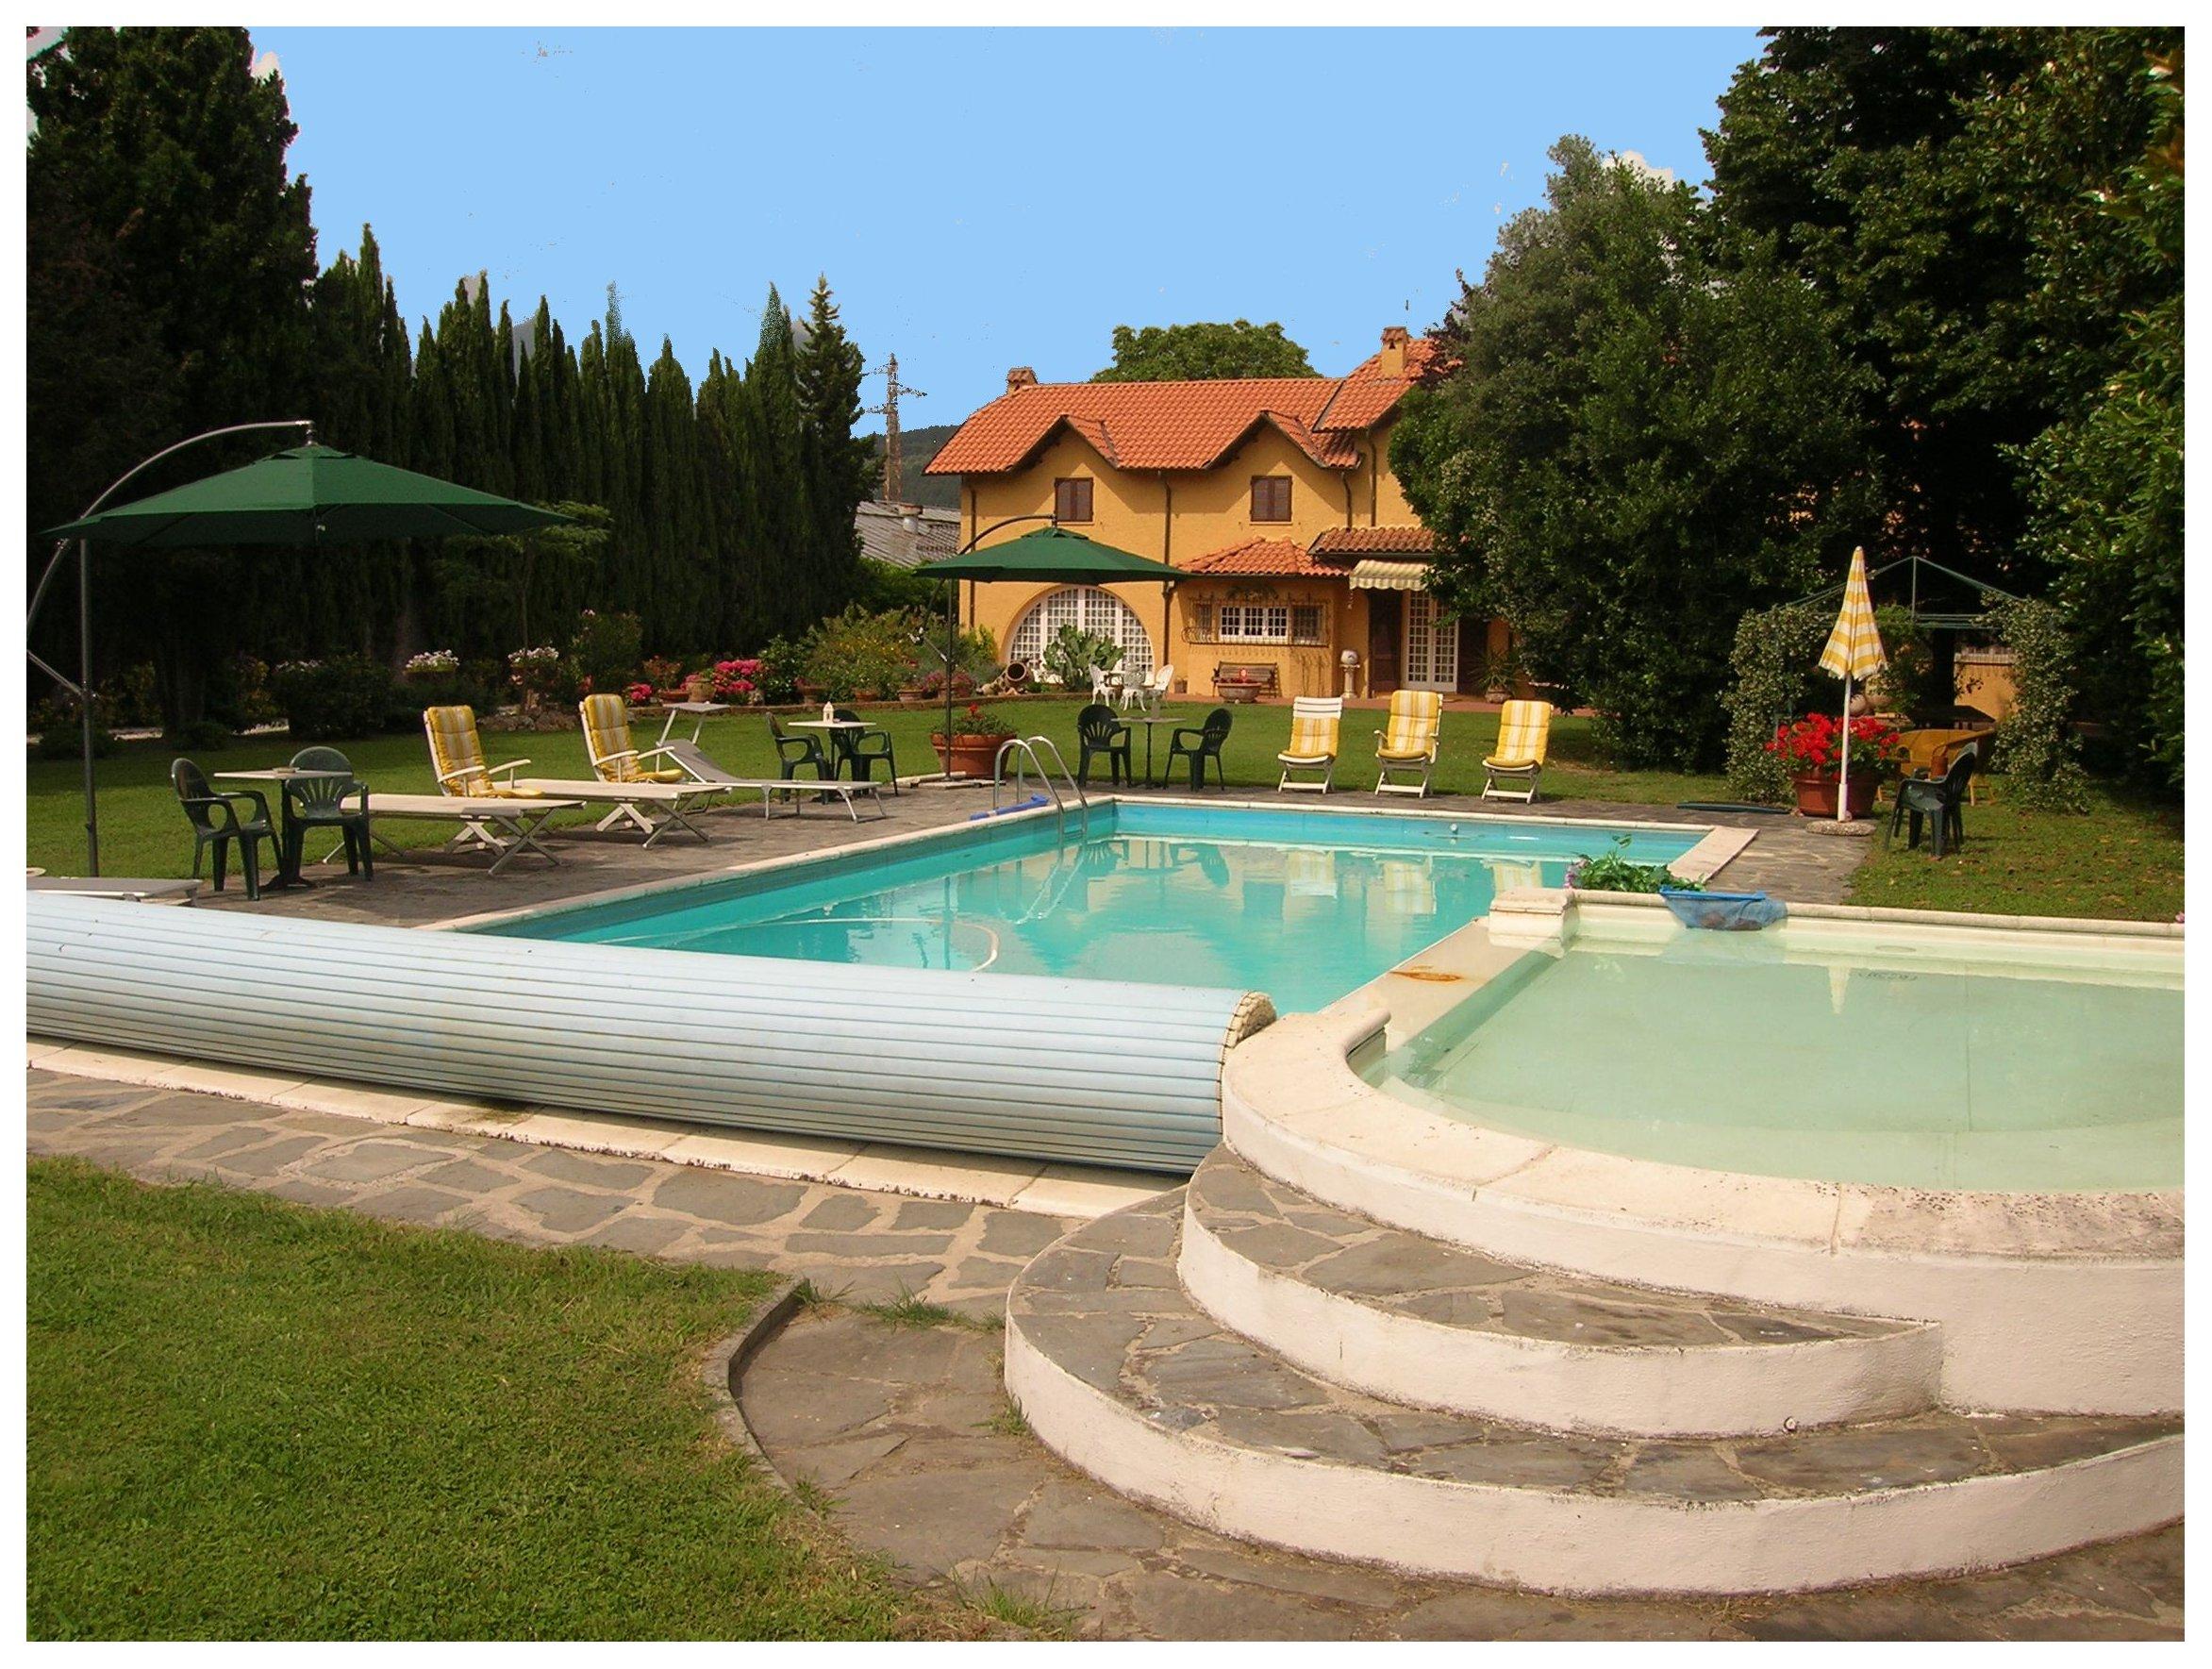 Moderna villa con la piscina - Villa con piscina milano ...